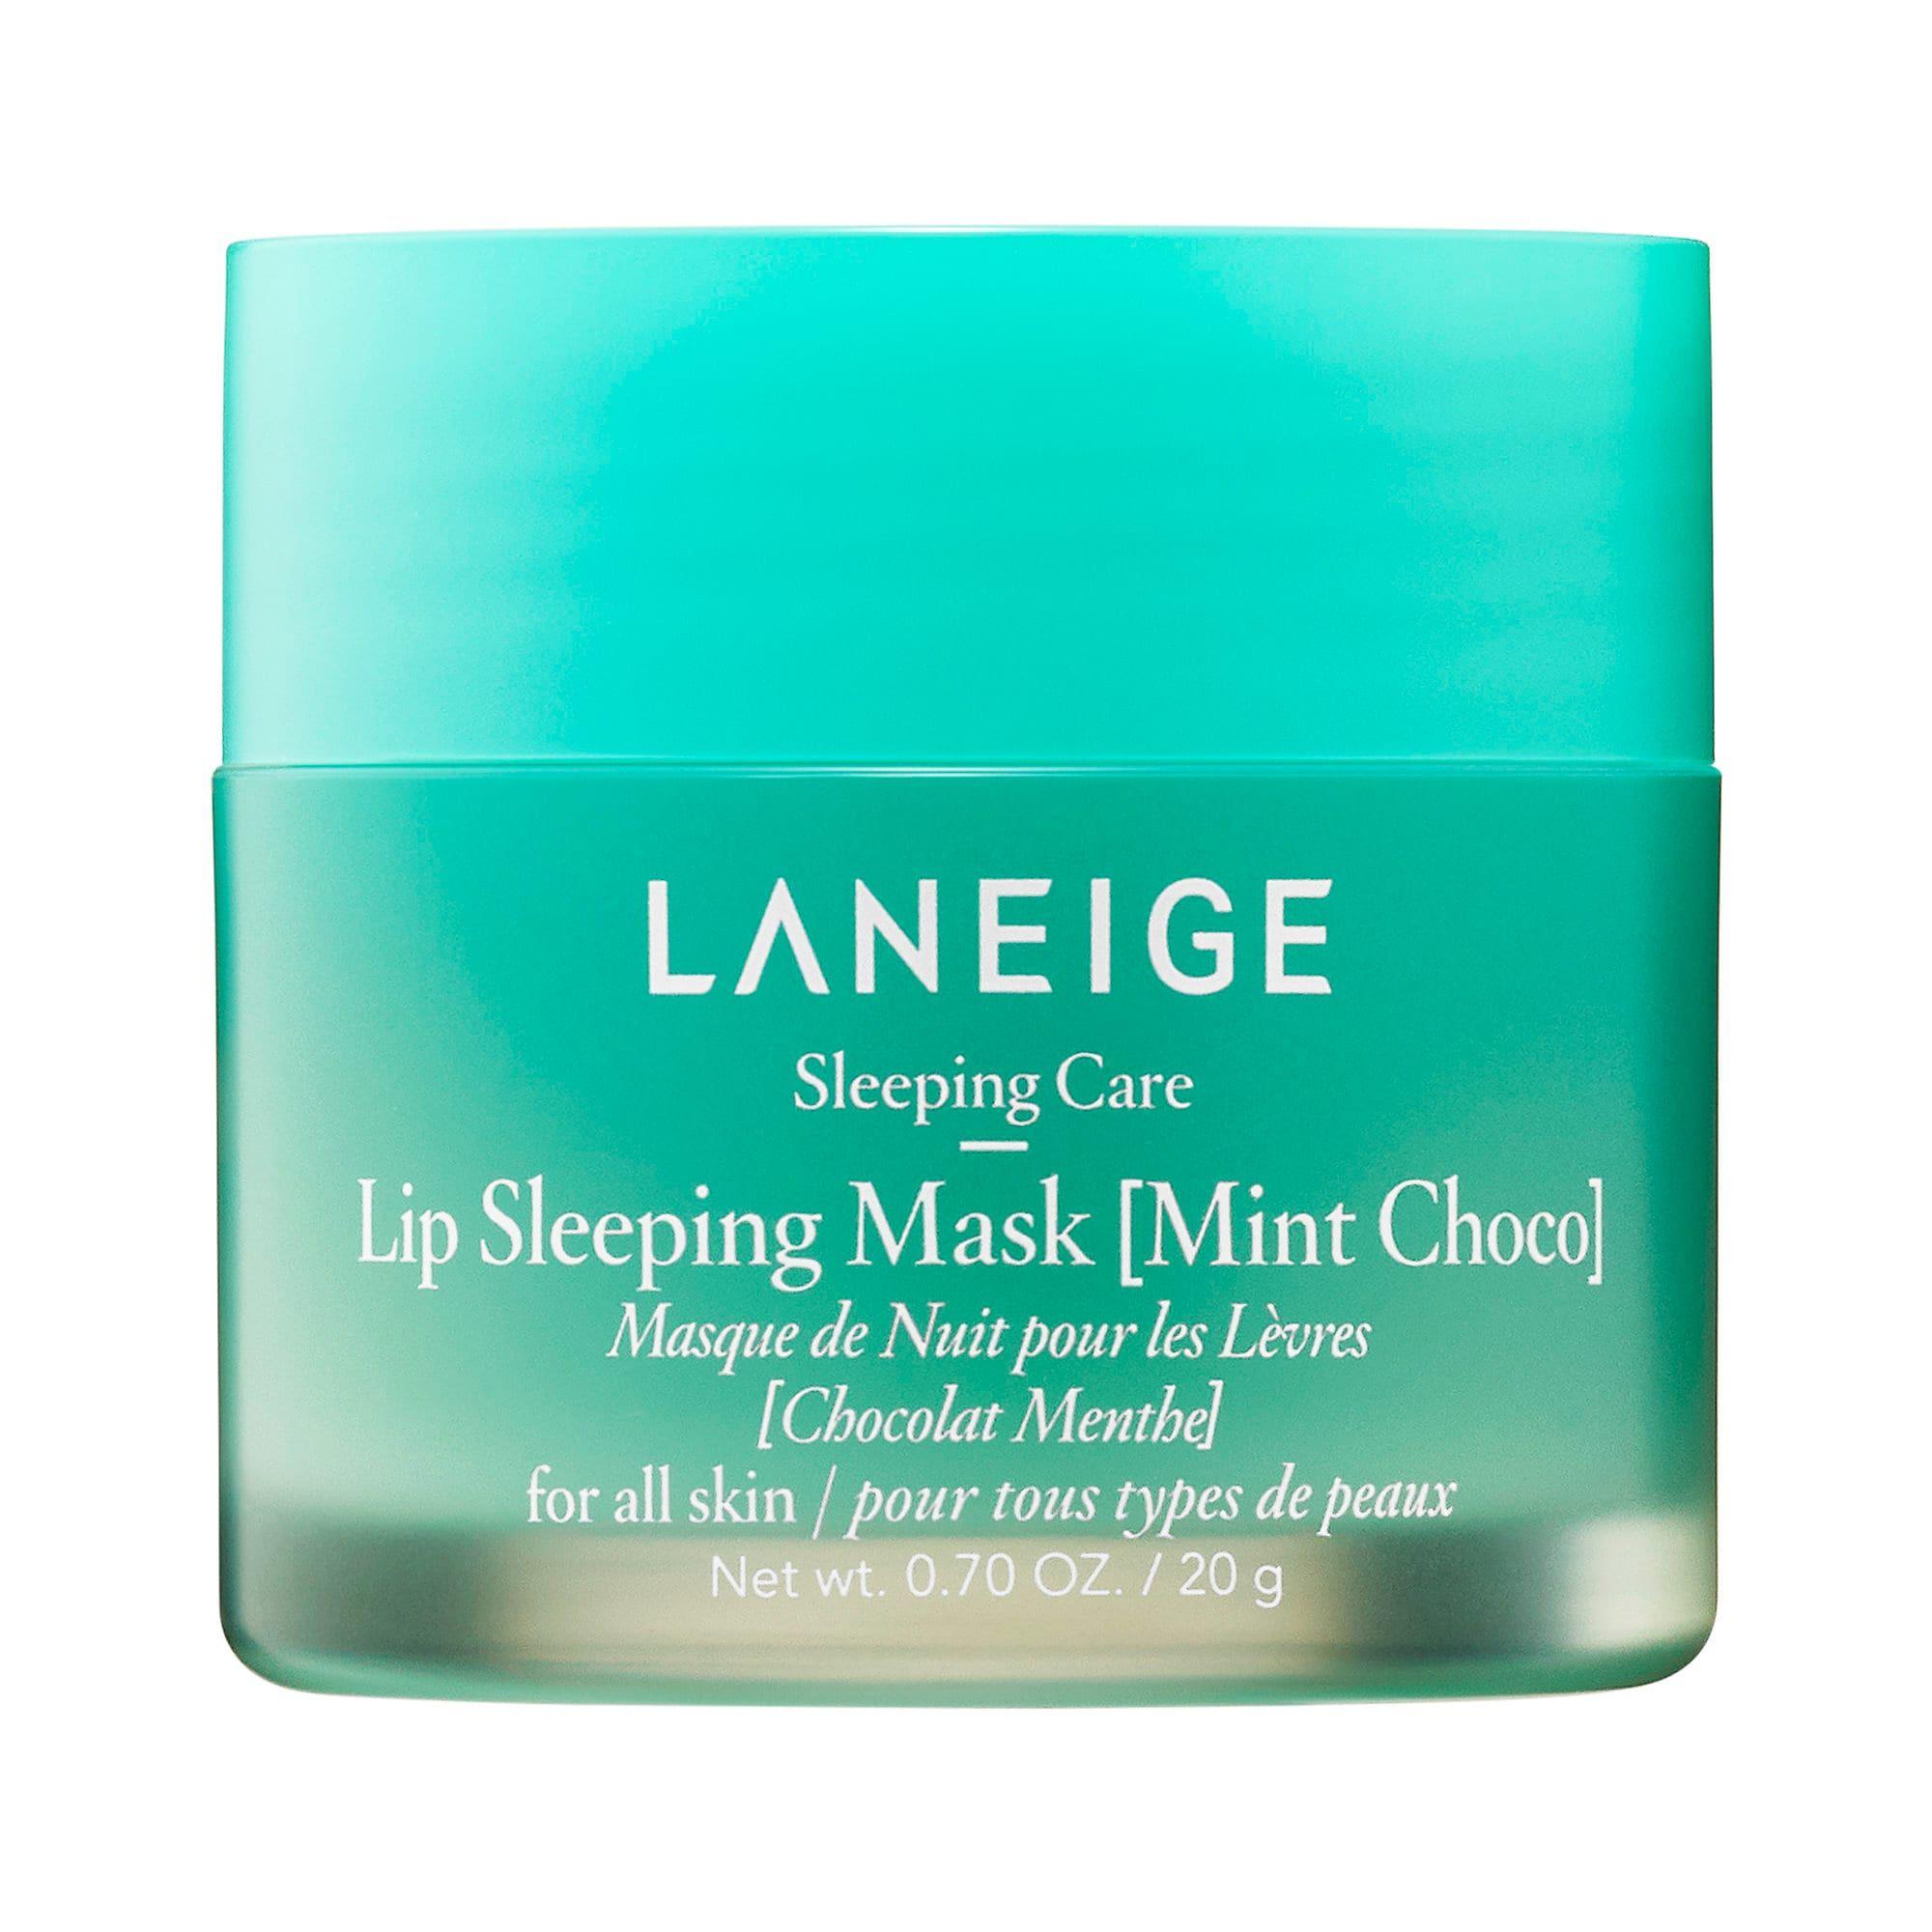 Laneige Lip Sleeping Mask Limited Edition Mint Chocolate